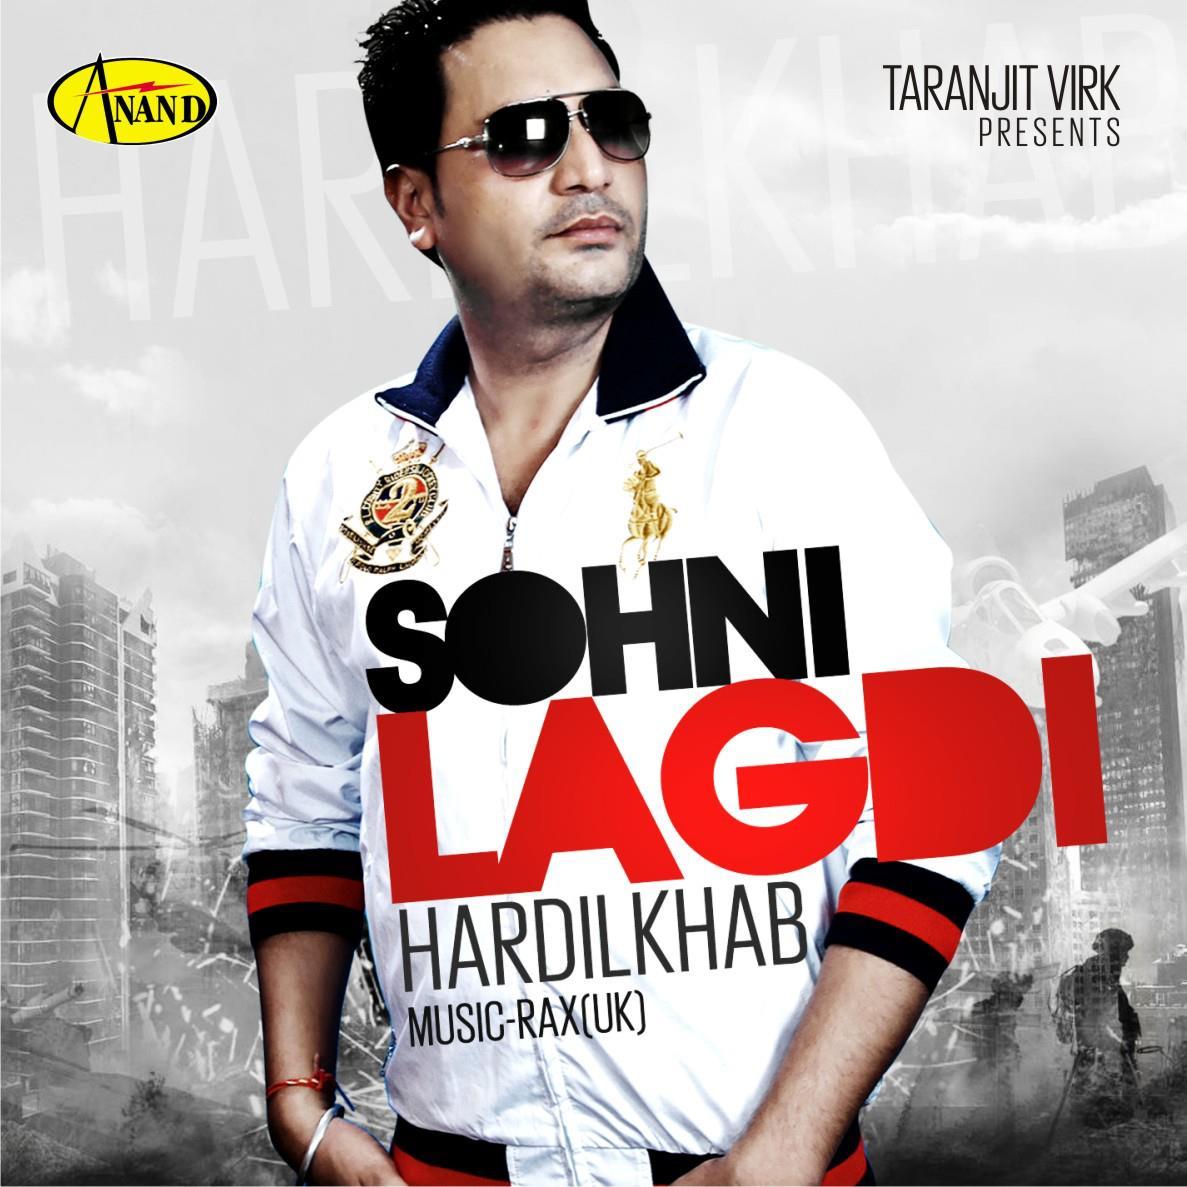 87 hardil khab sohni lagdi music rax uk singer hardil khab music rax